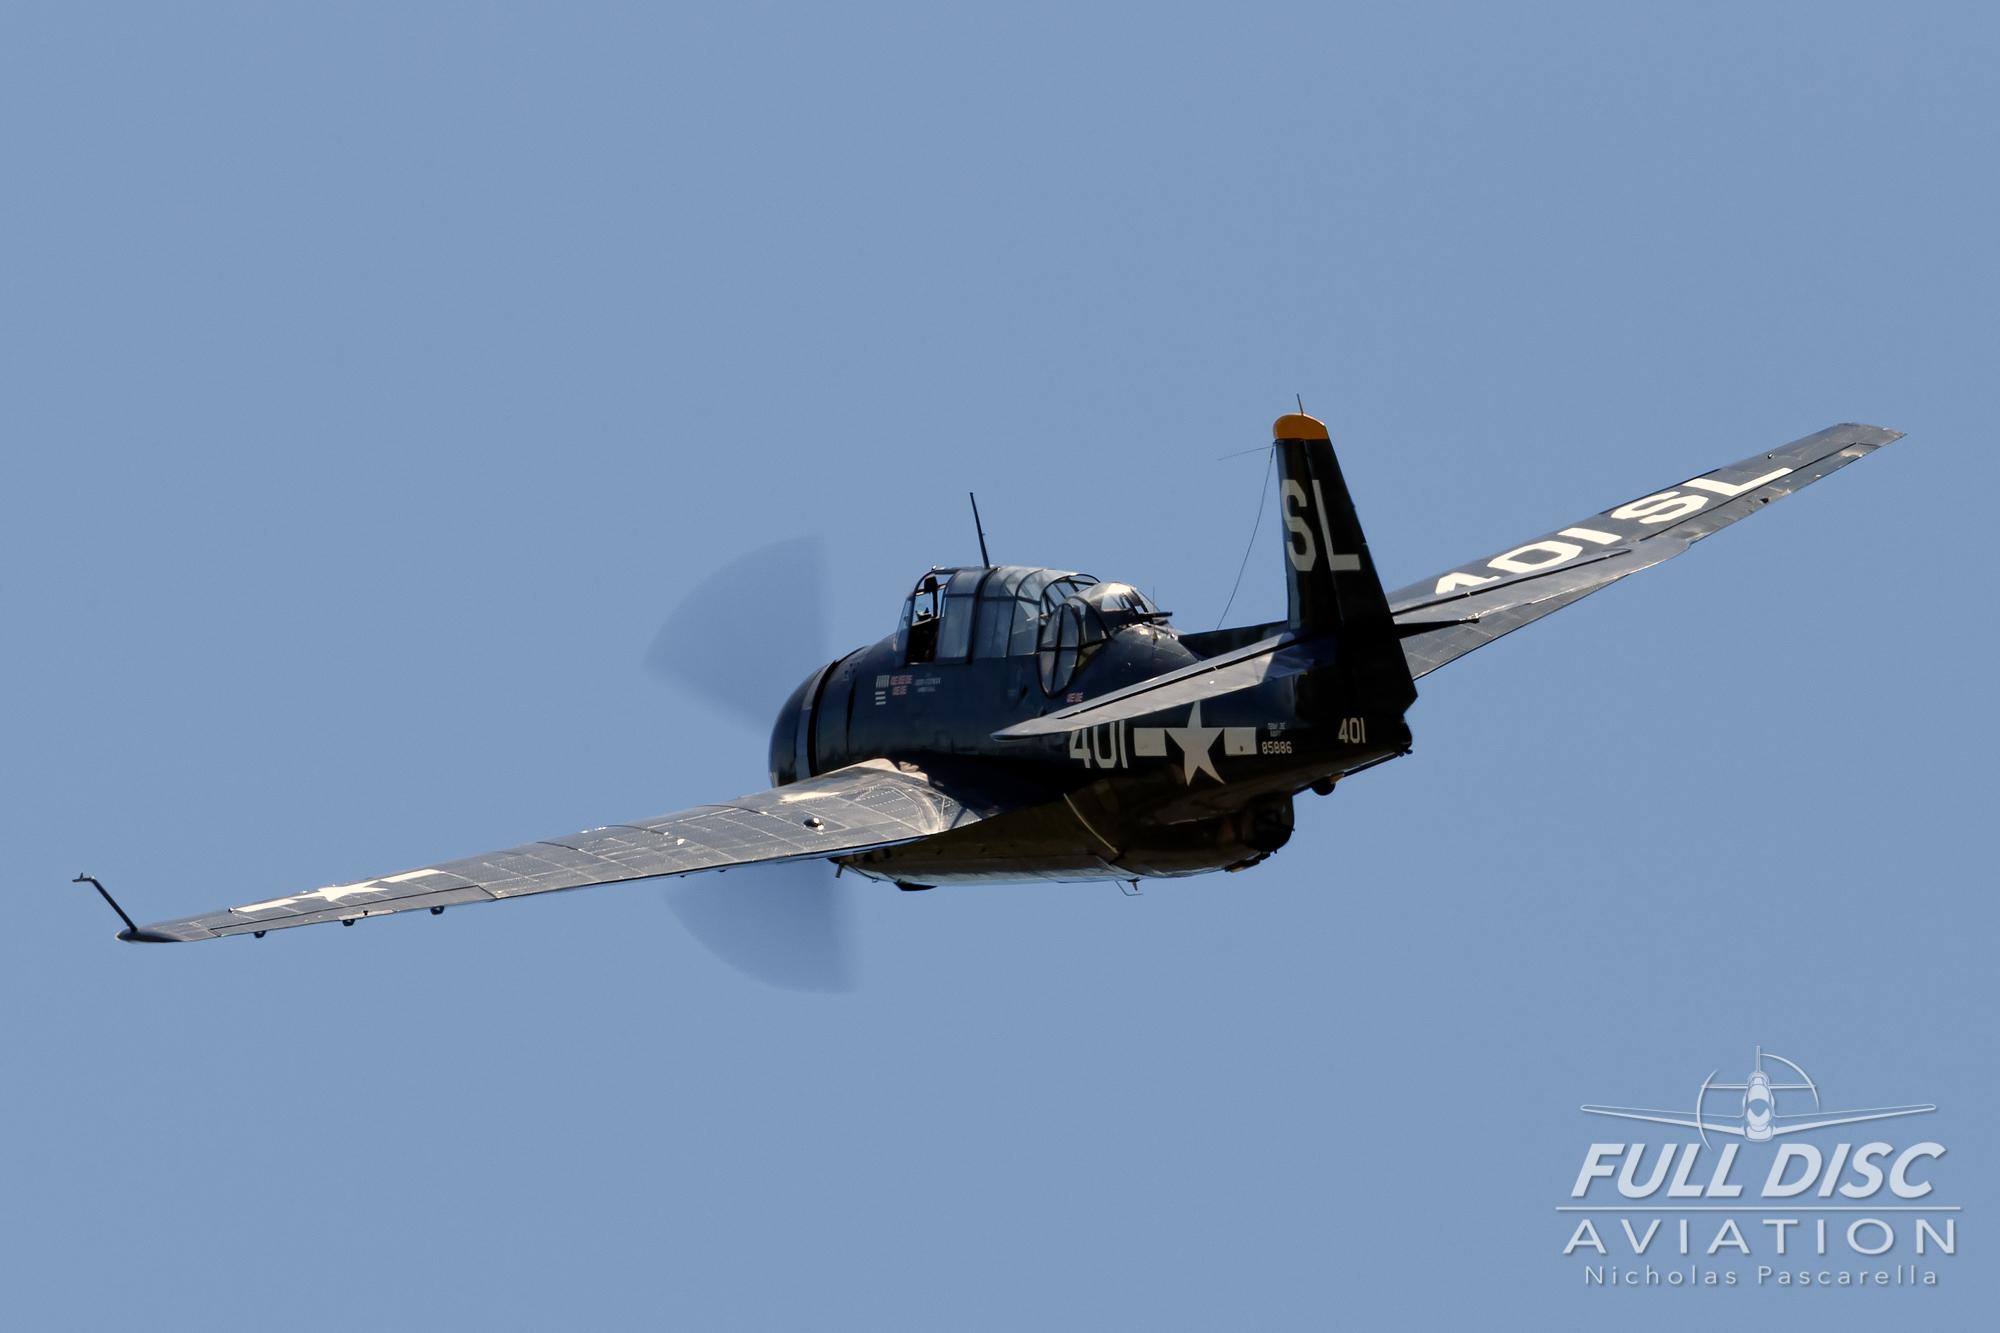 americanairpowermuseum_nicholaspascarella_nickpascarella_fulldiscaviation_legendsofairpower2019_aviation_warbird_tbmavenger_banking.jpg